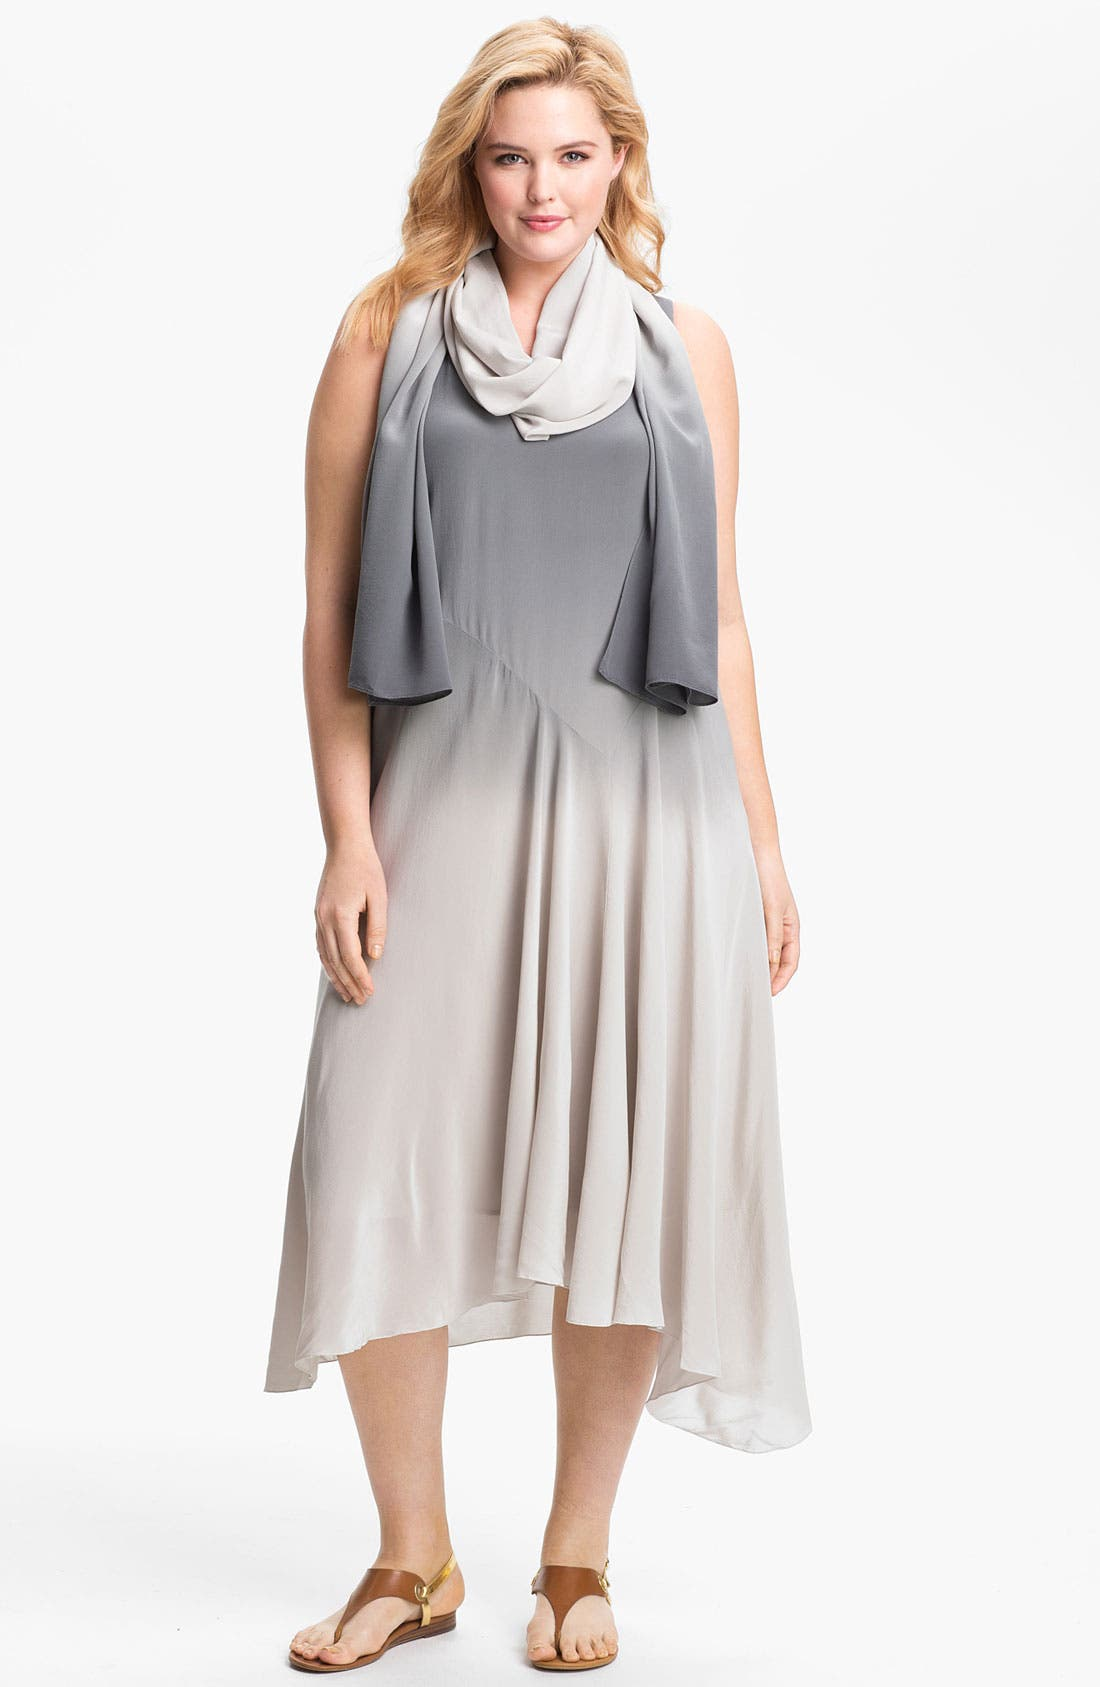 Alternate Image 1 Selected - Eileen Fisher Ombré Silk Dress (Plus Size)